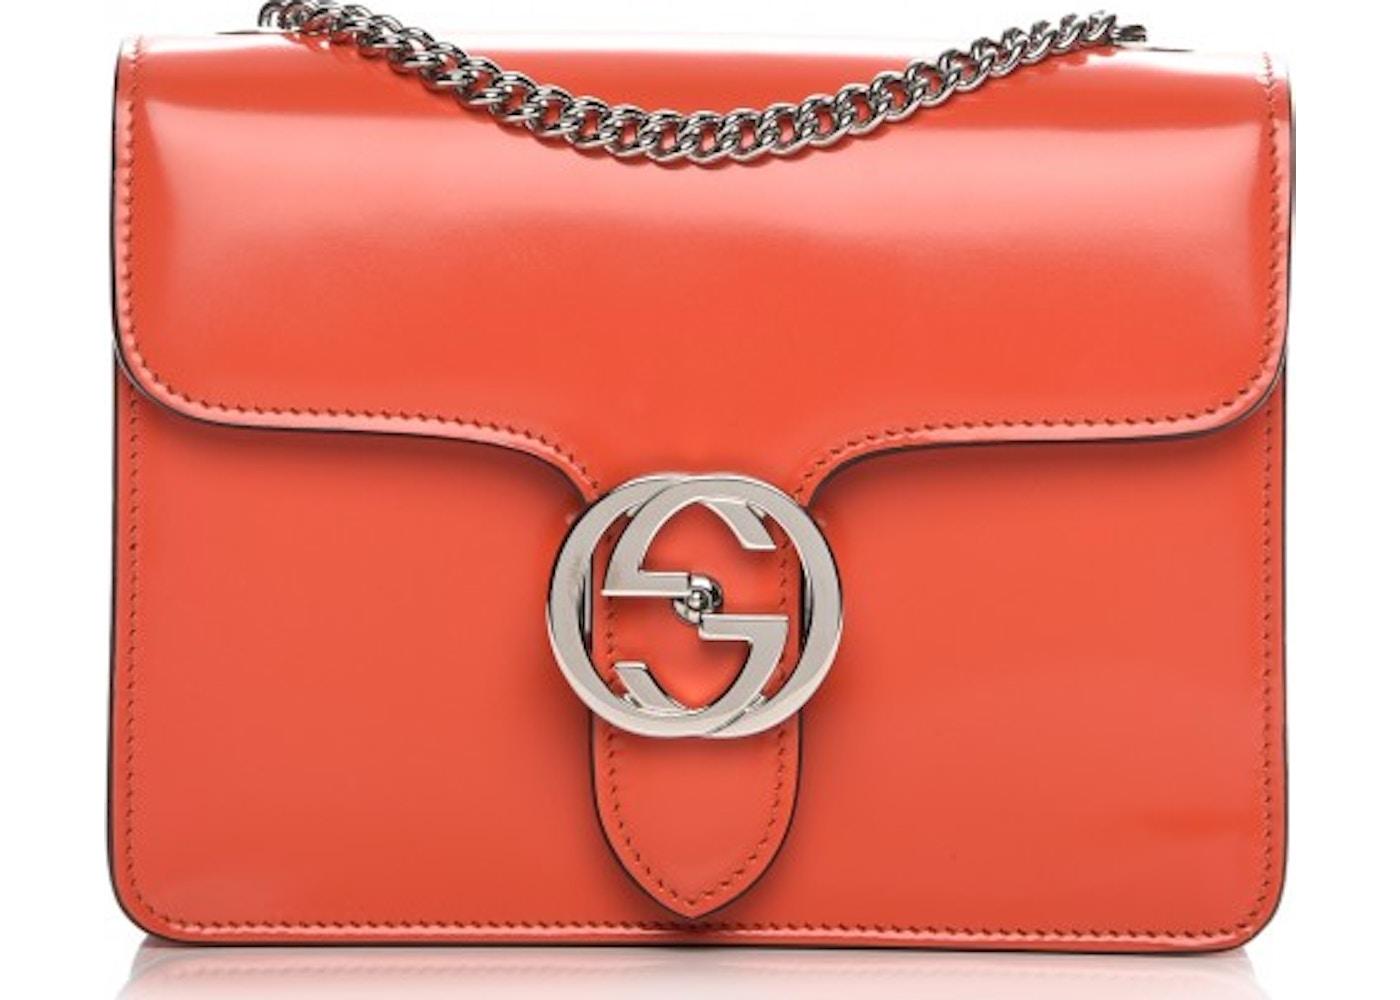 816c0d059c4c Gucci Interlocking Shoulder Bag GG Signature Interlocking Gucci ...